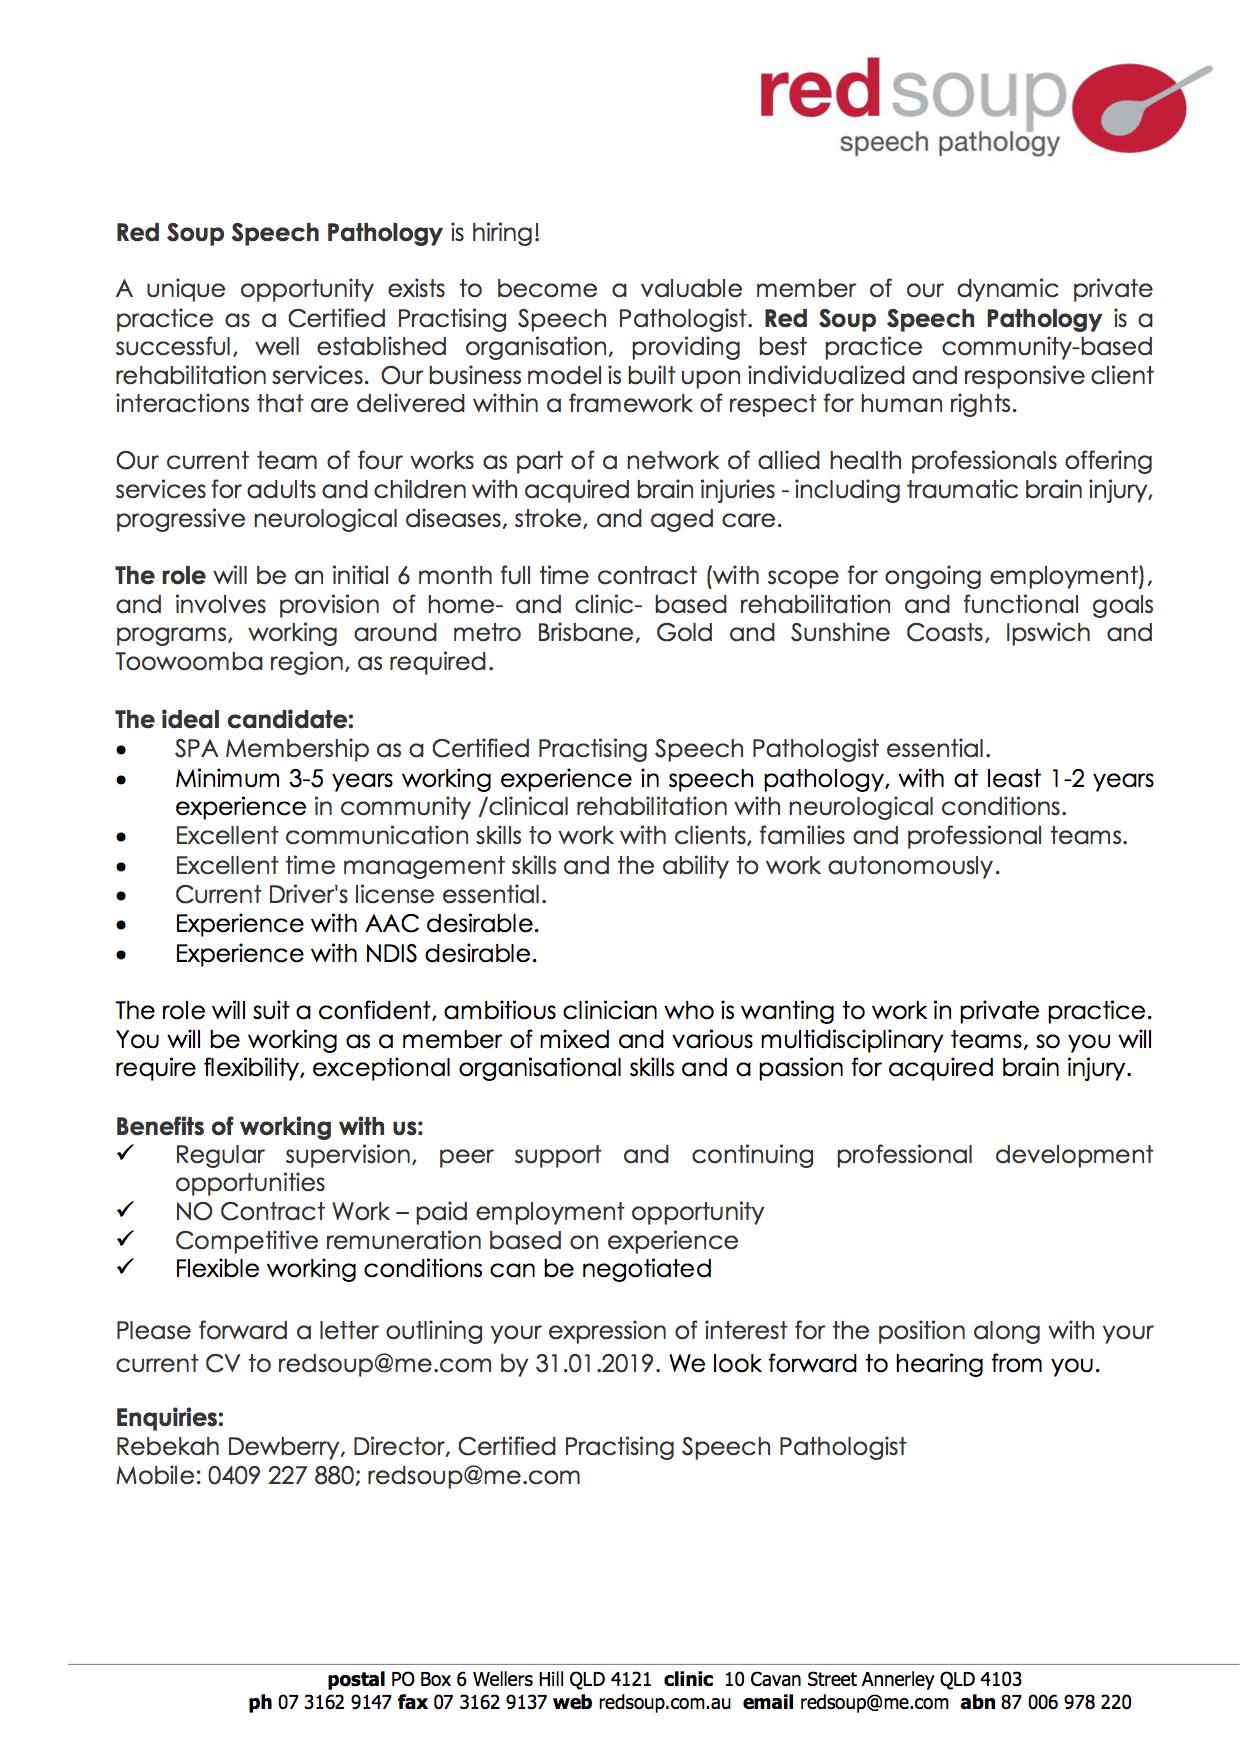 Red Soup Speech Pathology Job Advertisement JAN2019